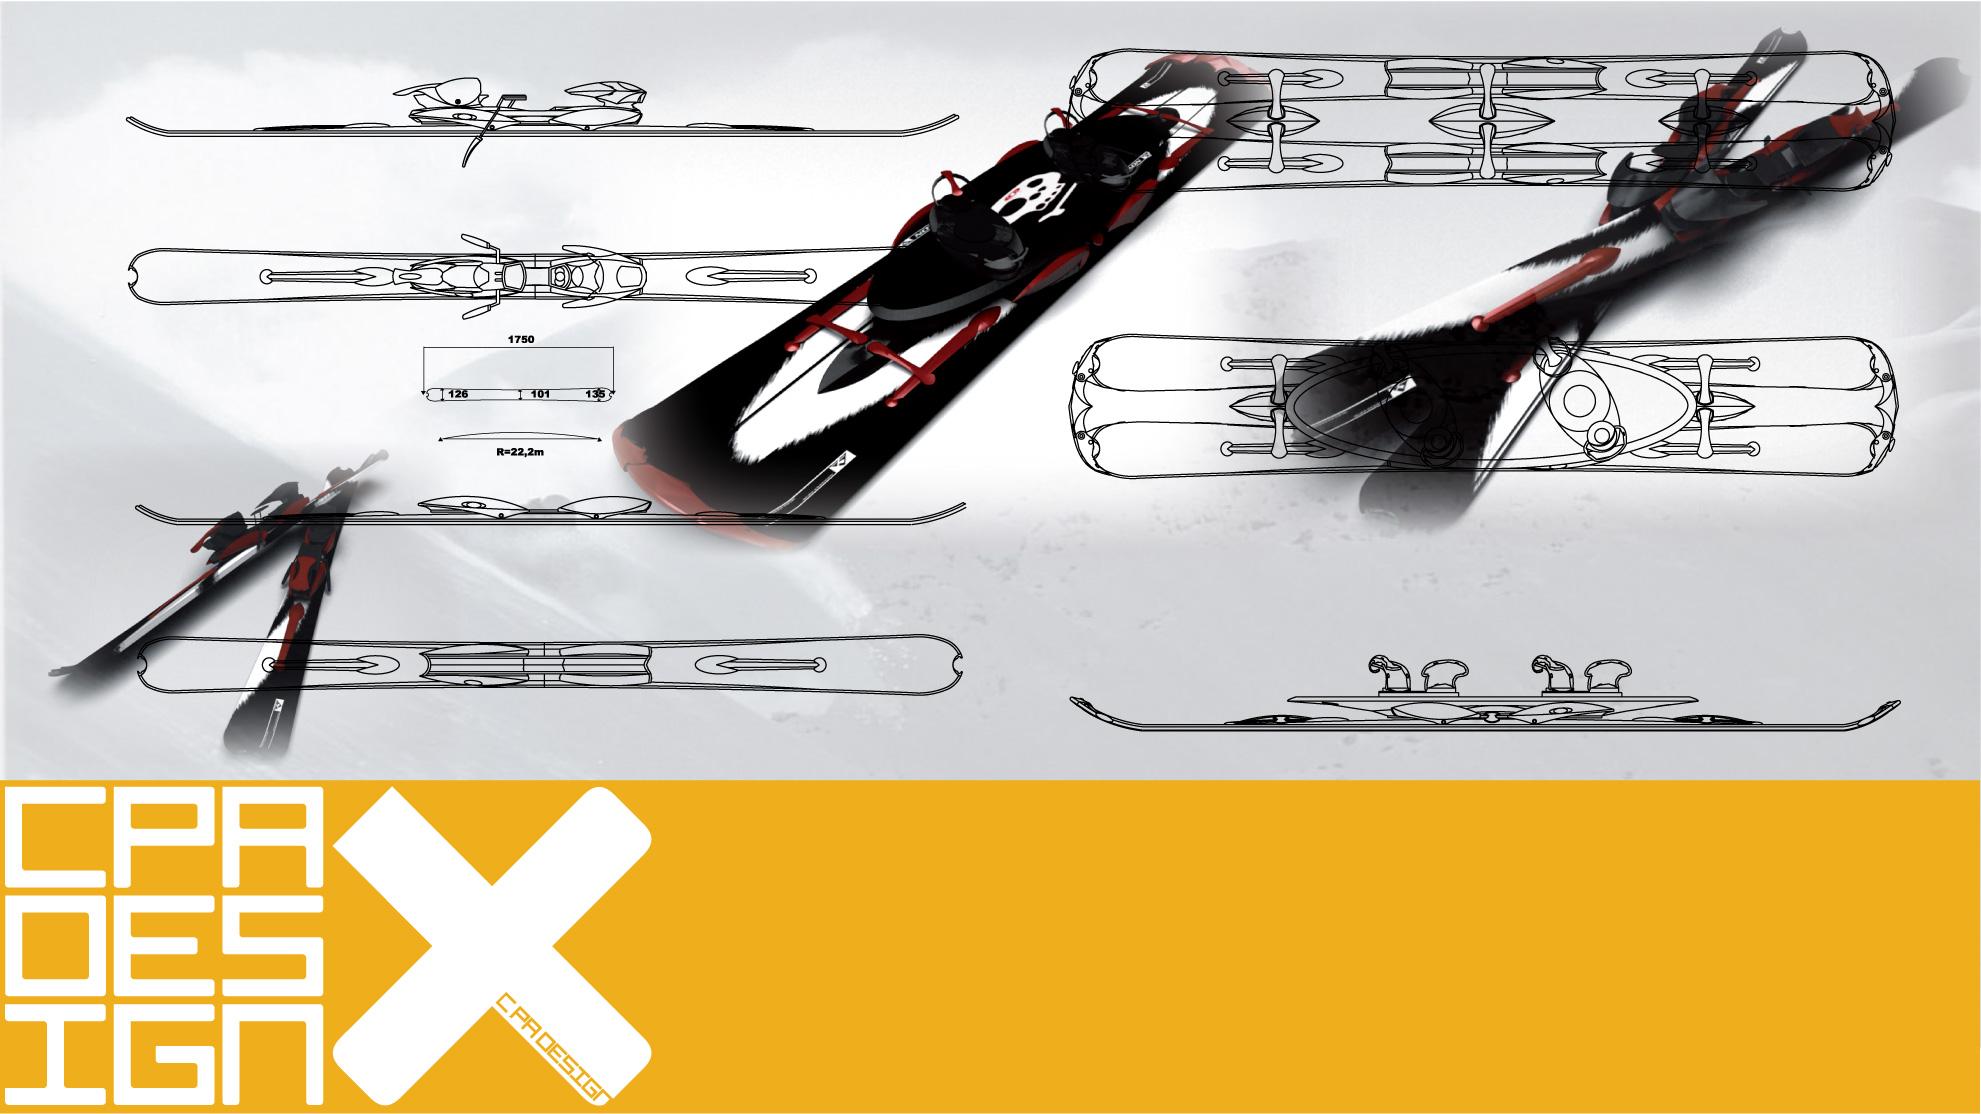 c_pa_design_produit_design-illlustration-projet